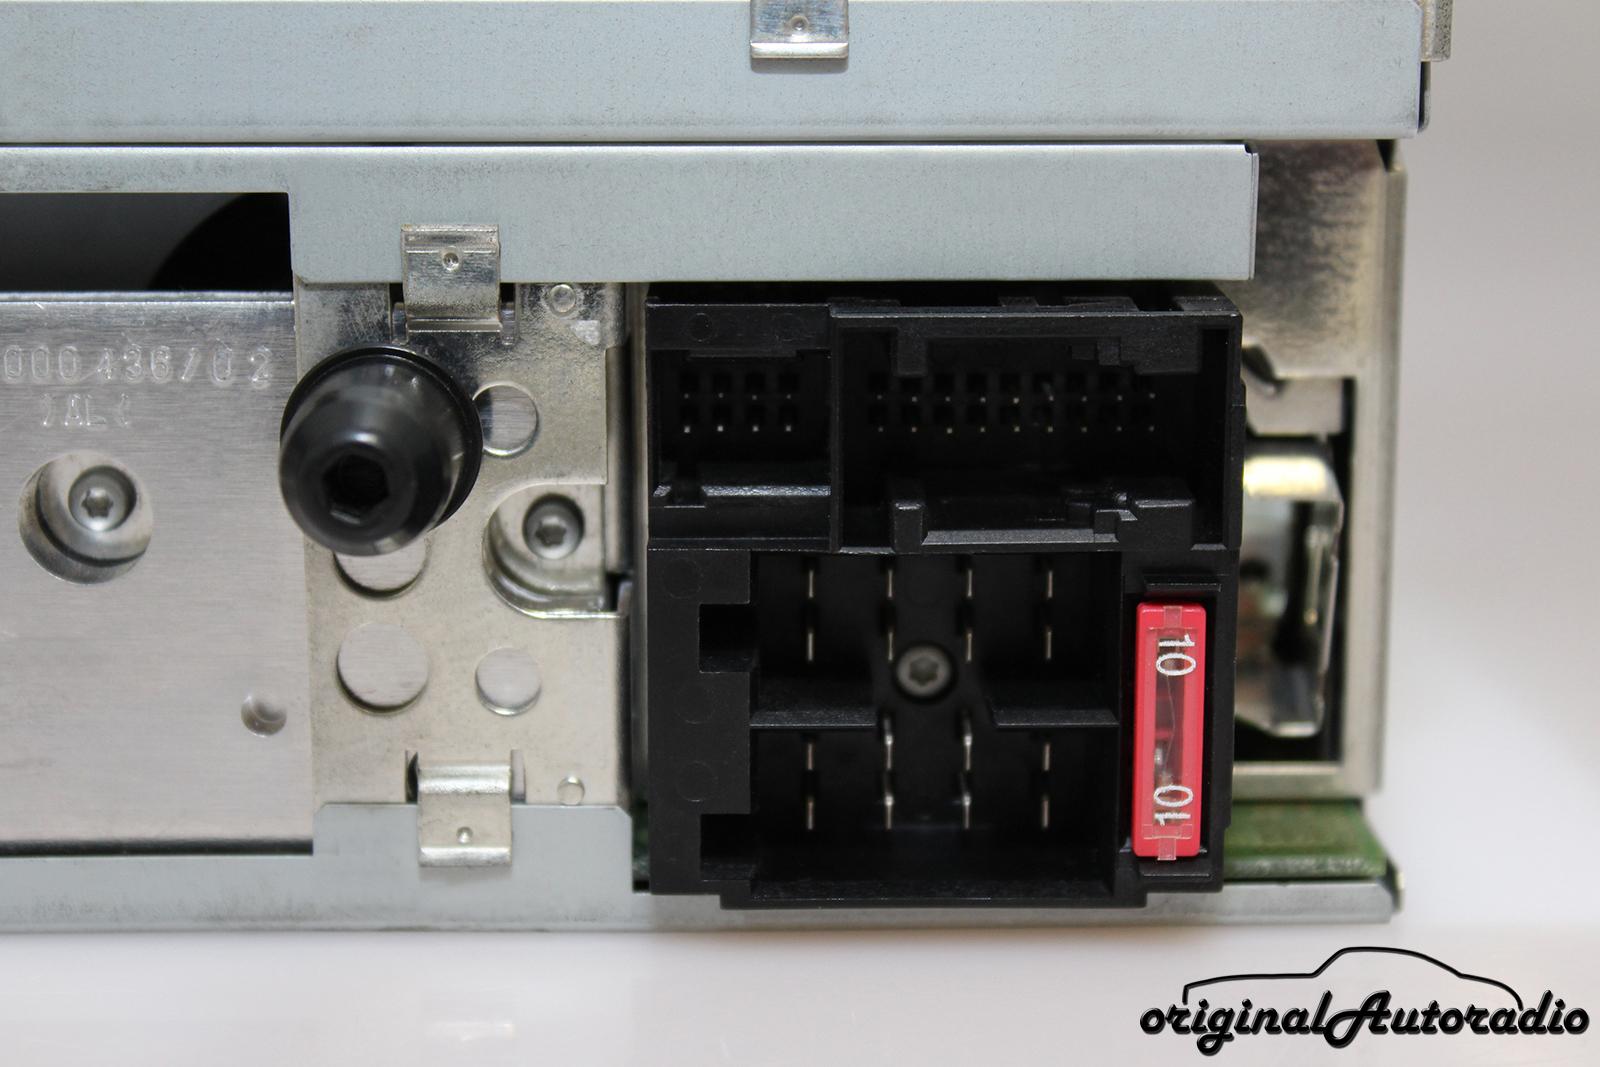 Mercedes CLK w208 a208 compartiment bac sous radio a2086800191 Orig